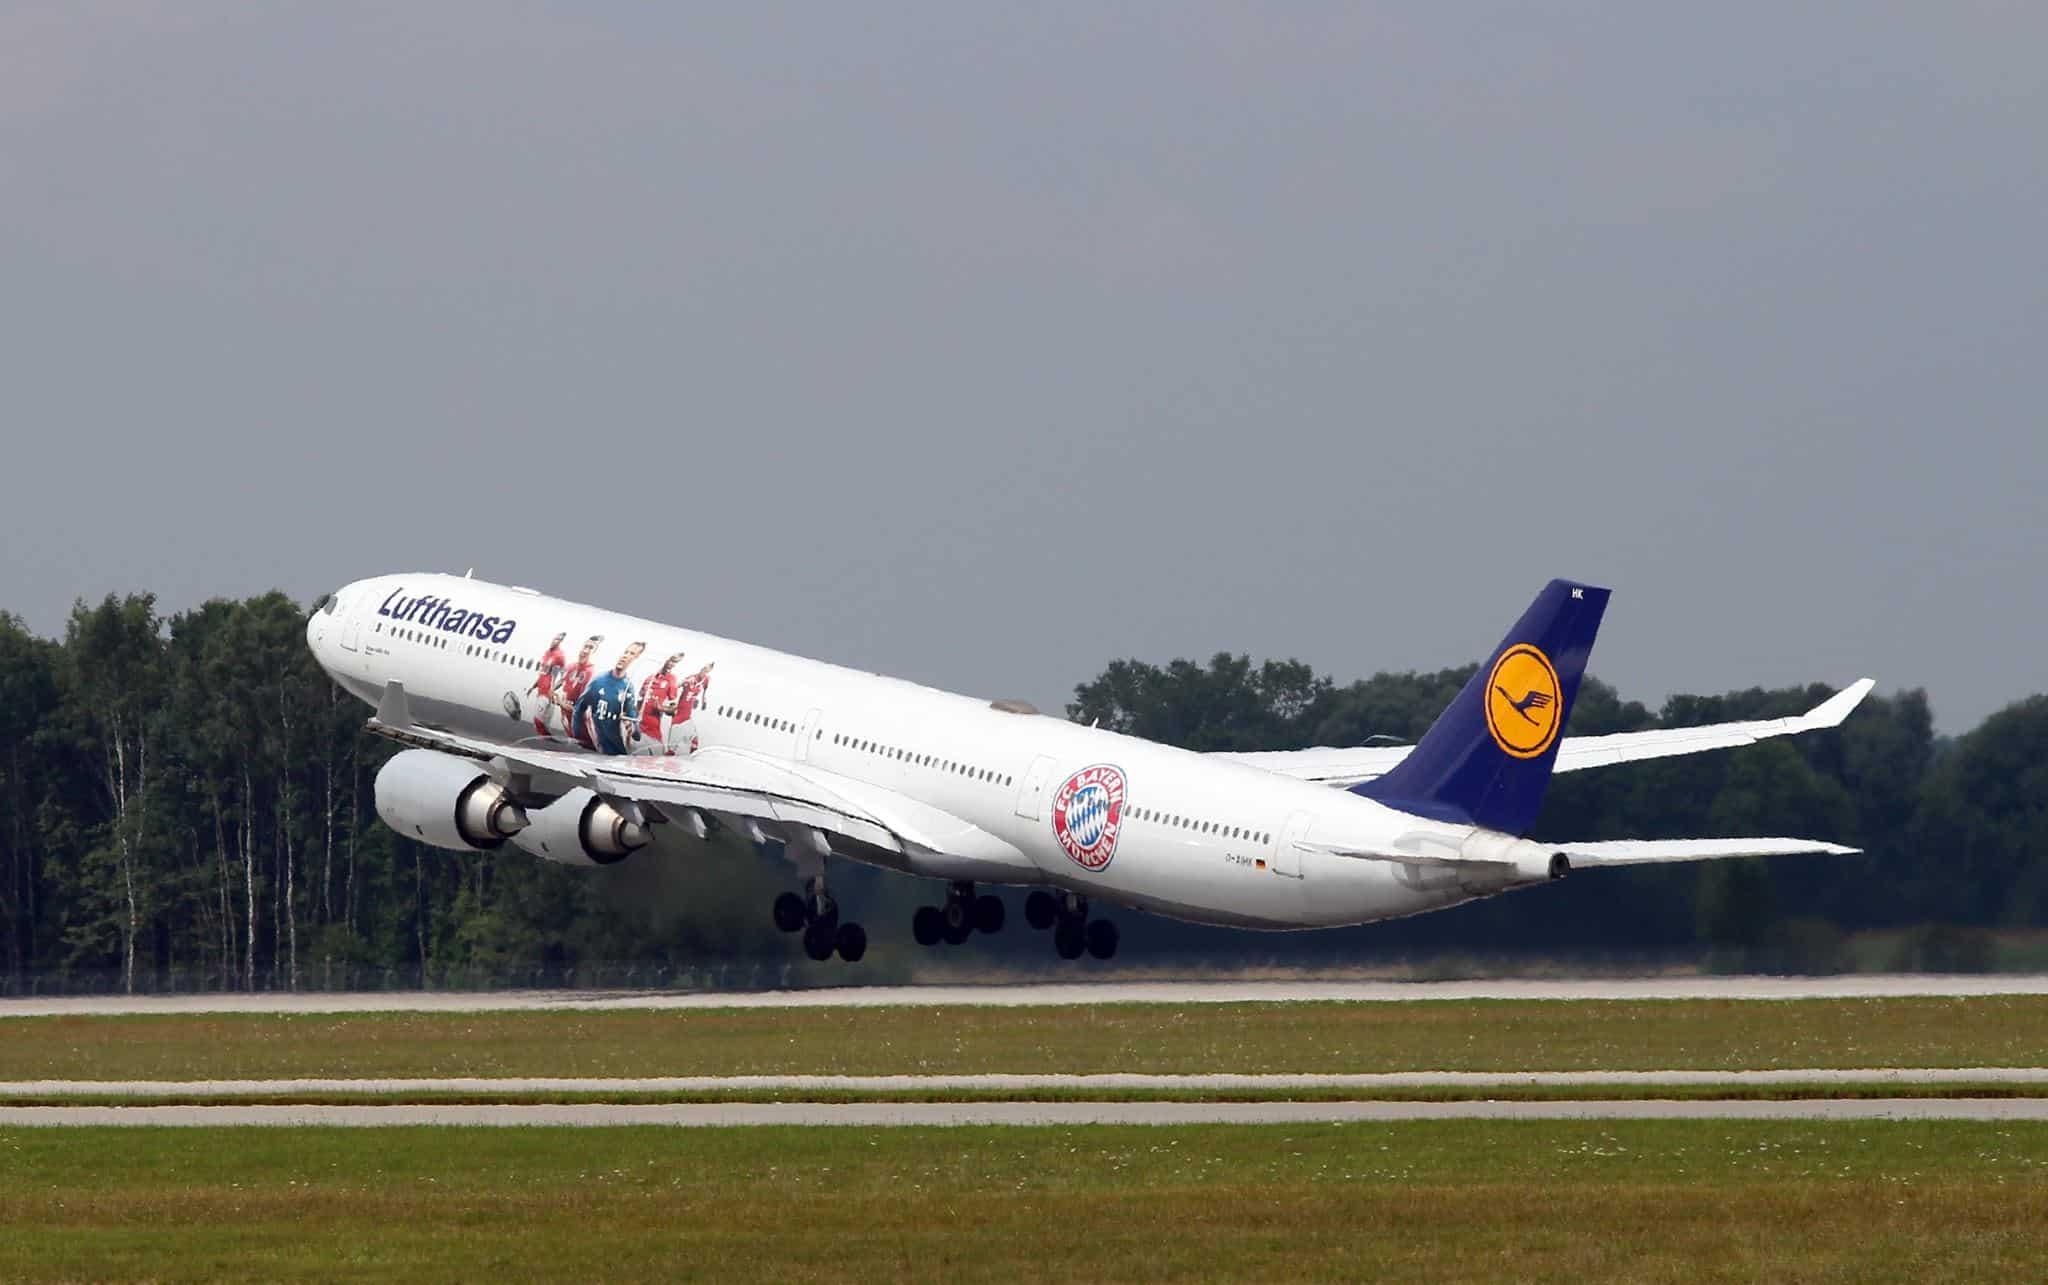 Airbus-A340-600-Lufthansa-Bayern-Munchen